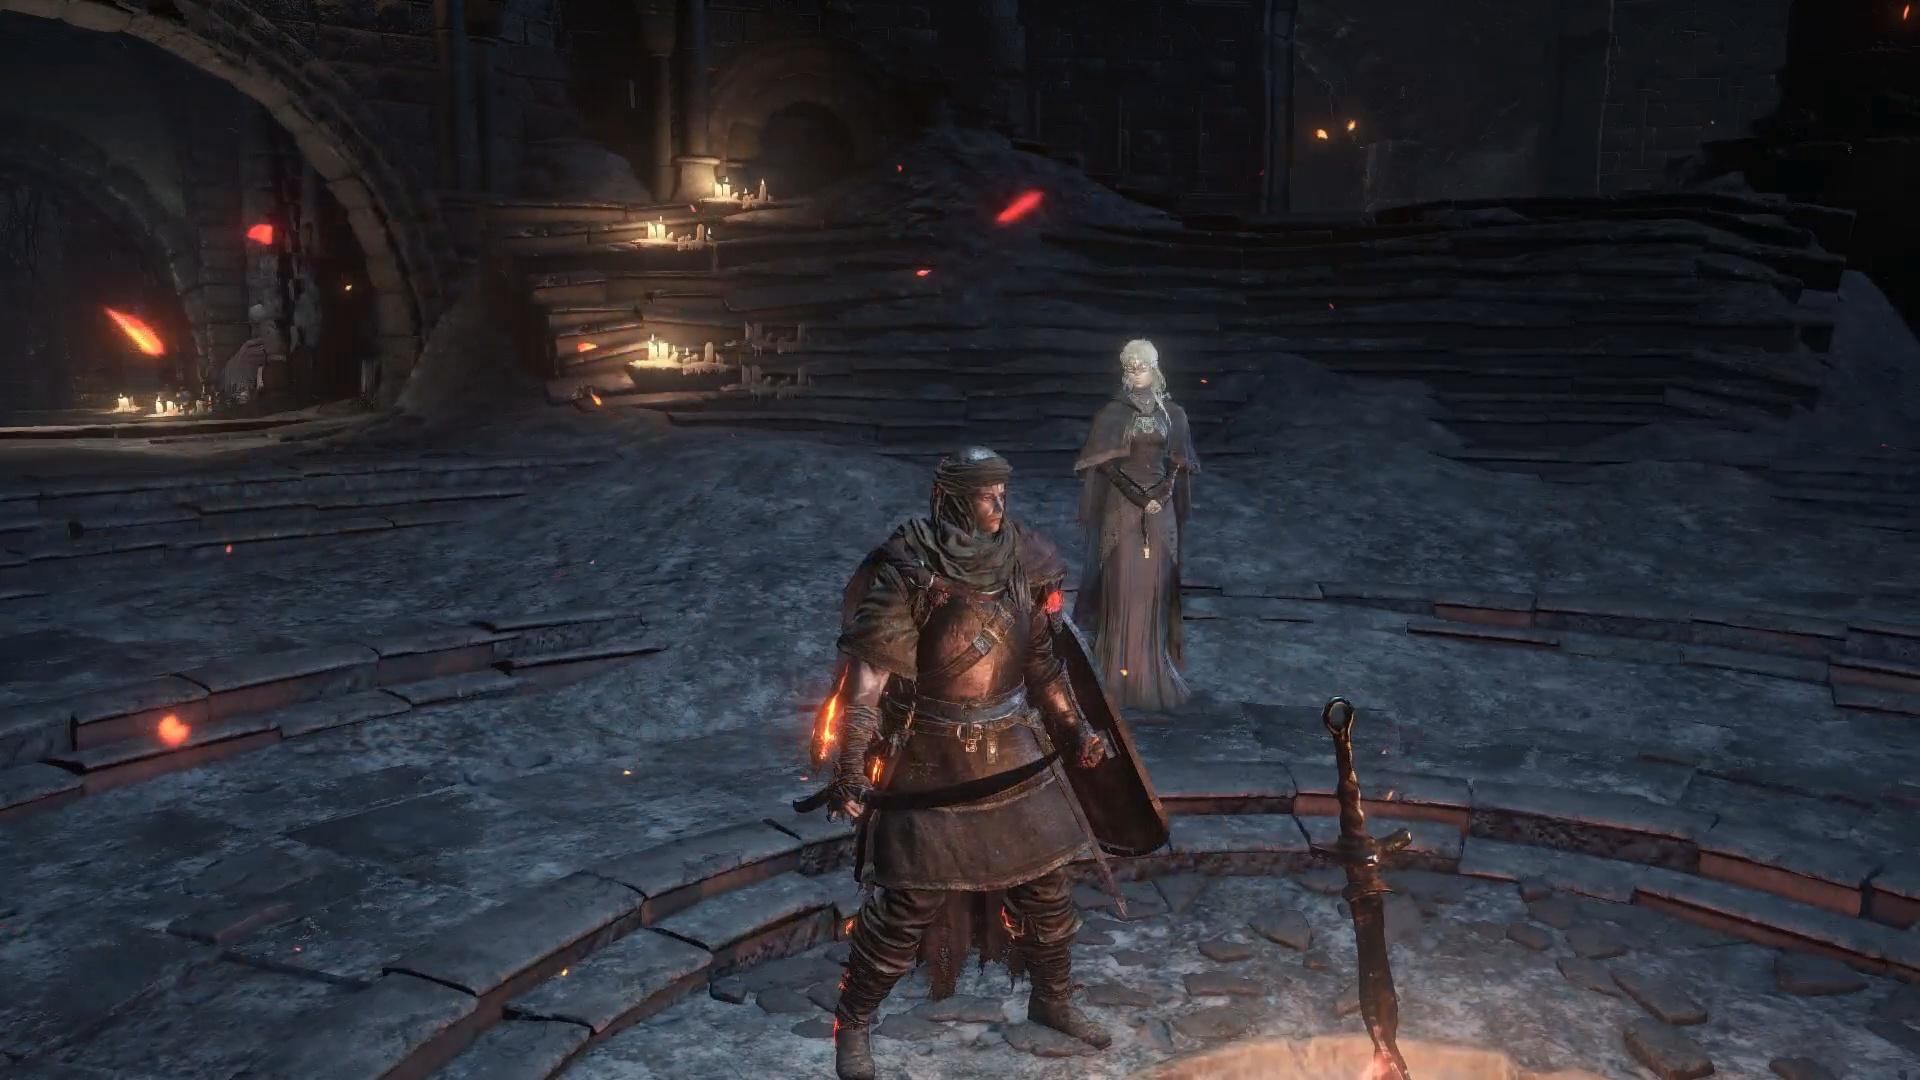 Dark Souls 3 Bonfire Wallpaper Posted By Ethan Thompson